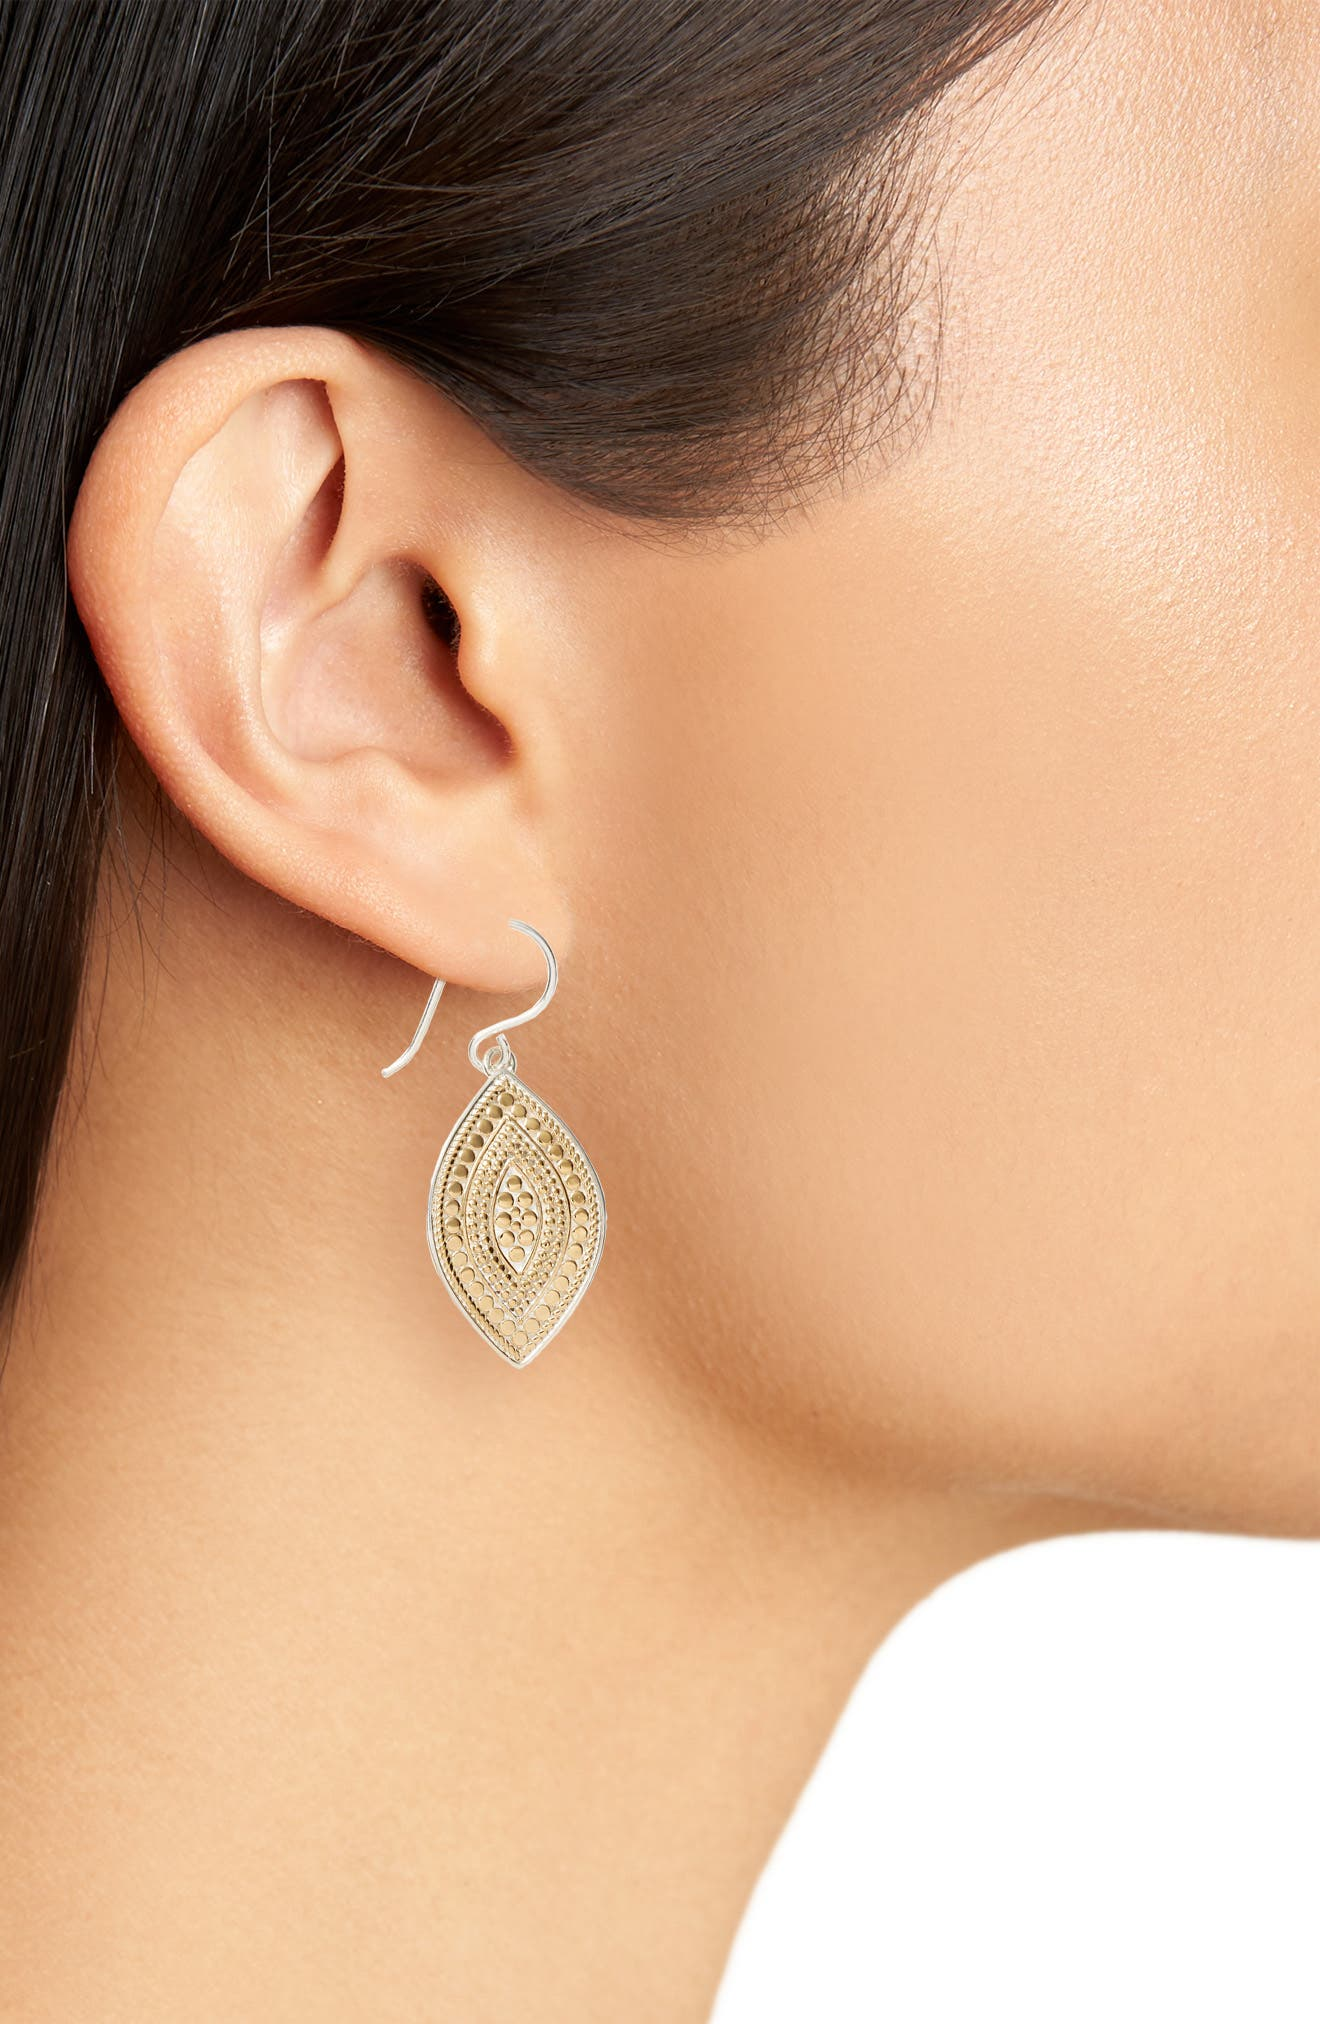 Drop Earrings,                             Alternate thumbnail 2, color,                             Gold/ Silver